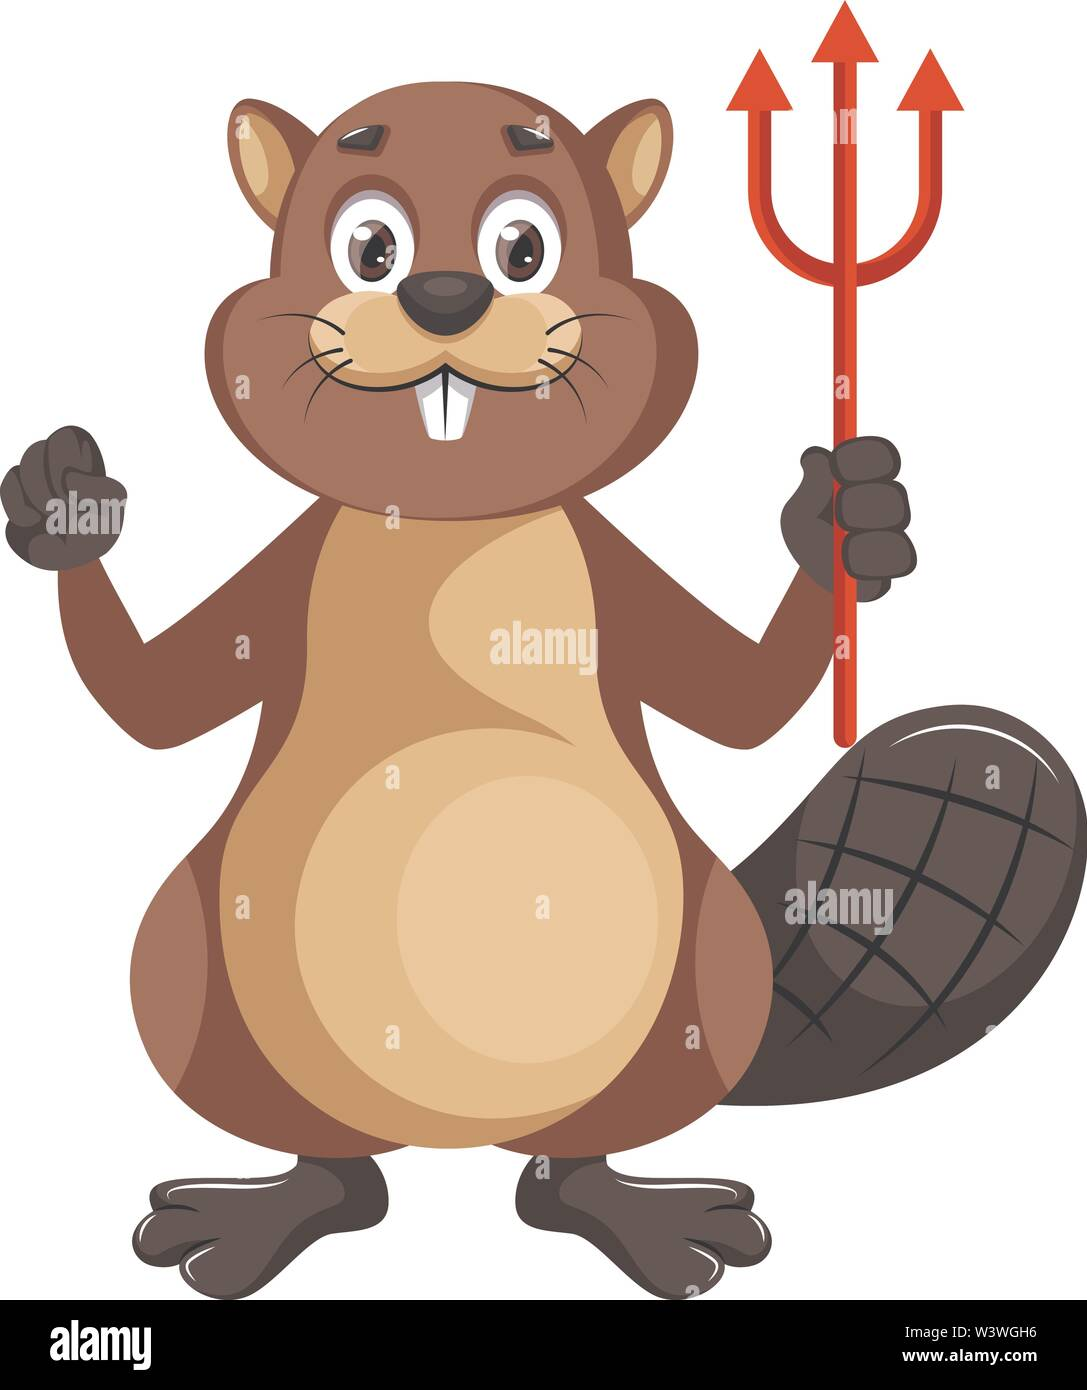 Beaver with devil spear, illustration, vector on white background. - Stock Image